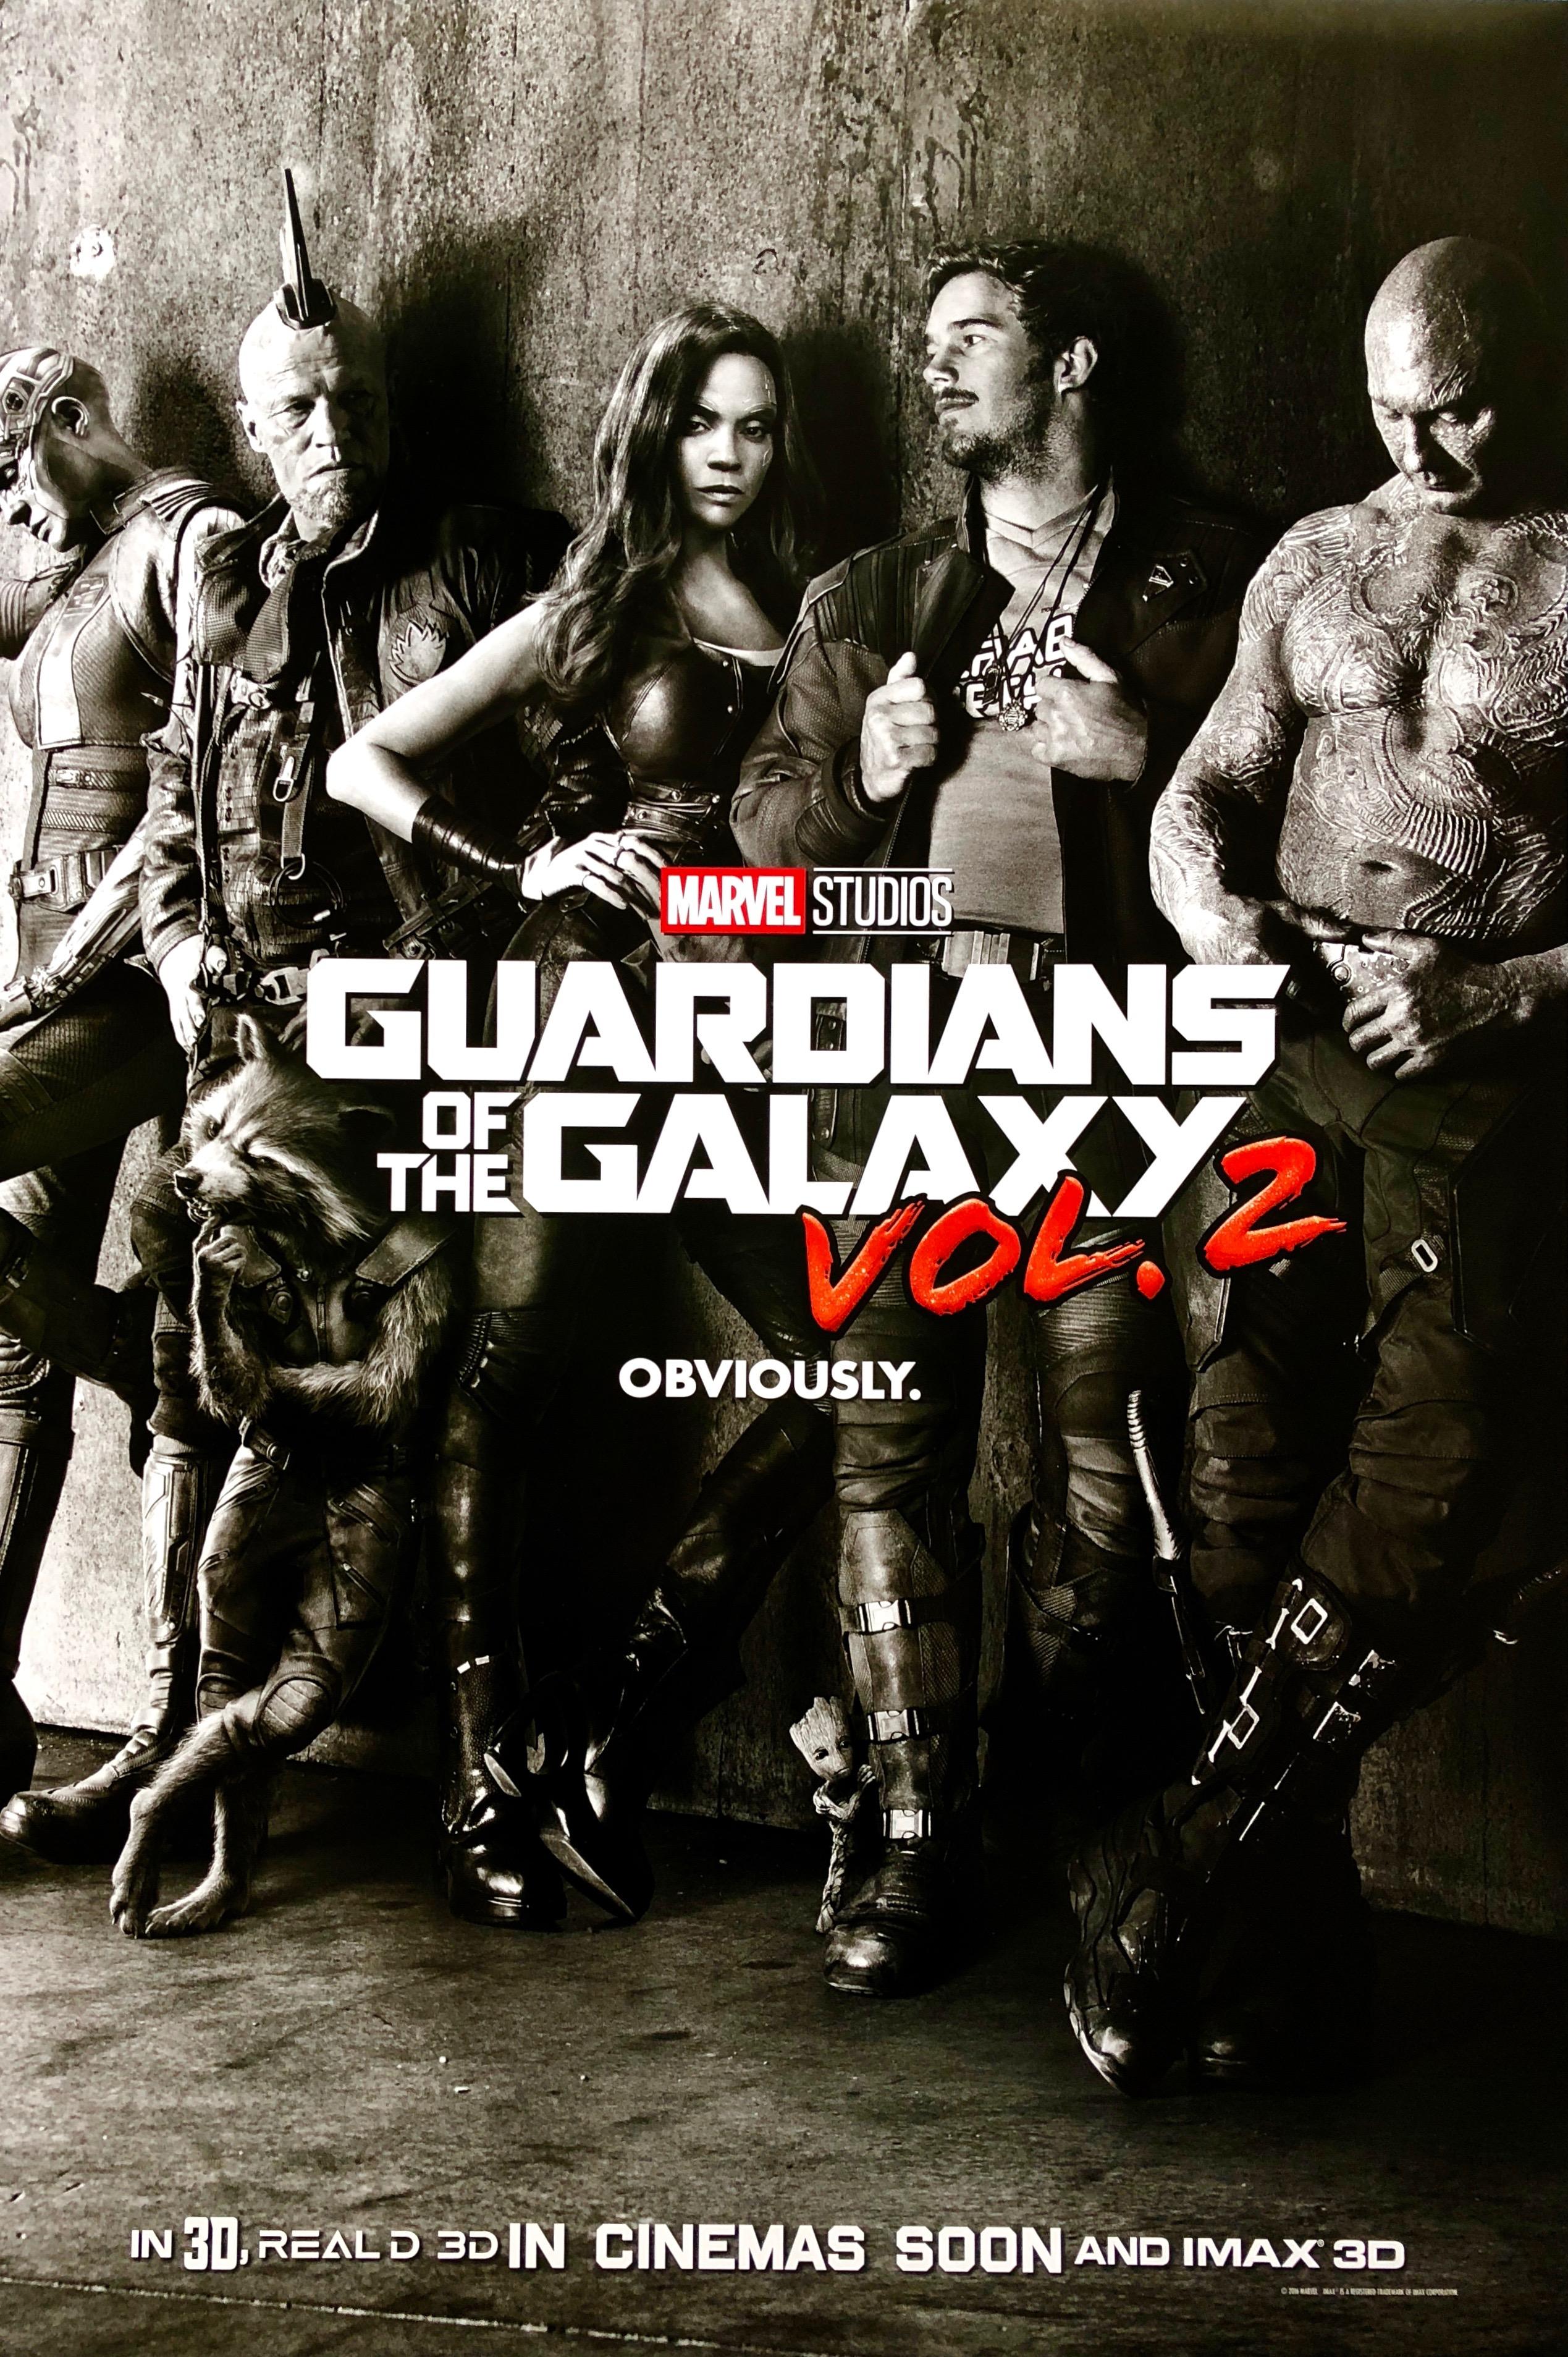 Original Guardians Of The Galaxy Vol 2 Movie Poster Marvel Studios